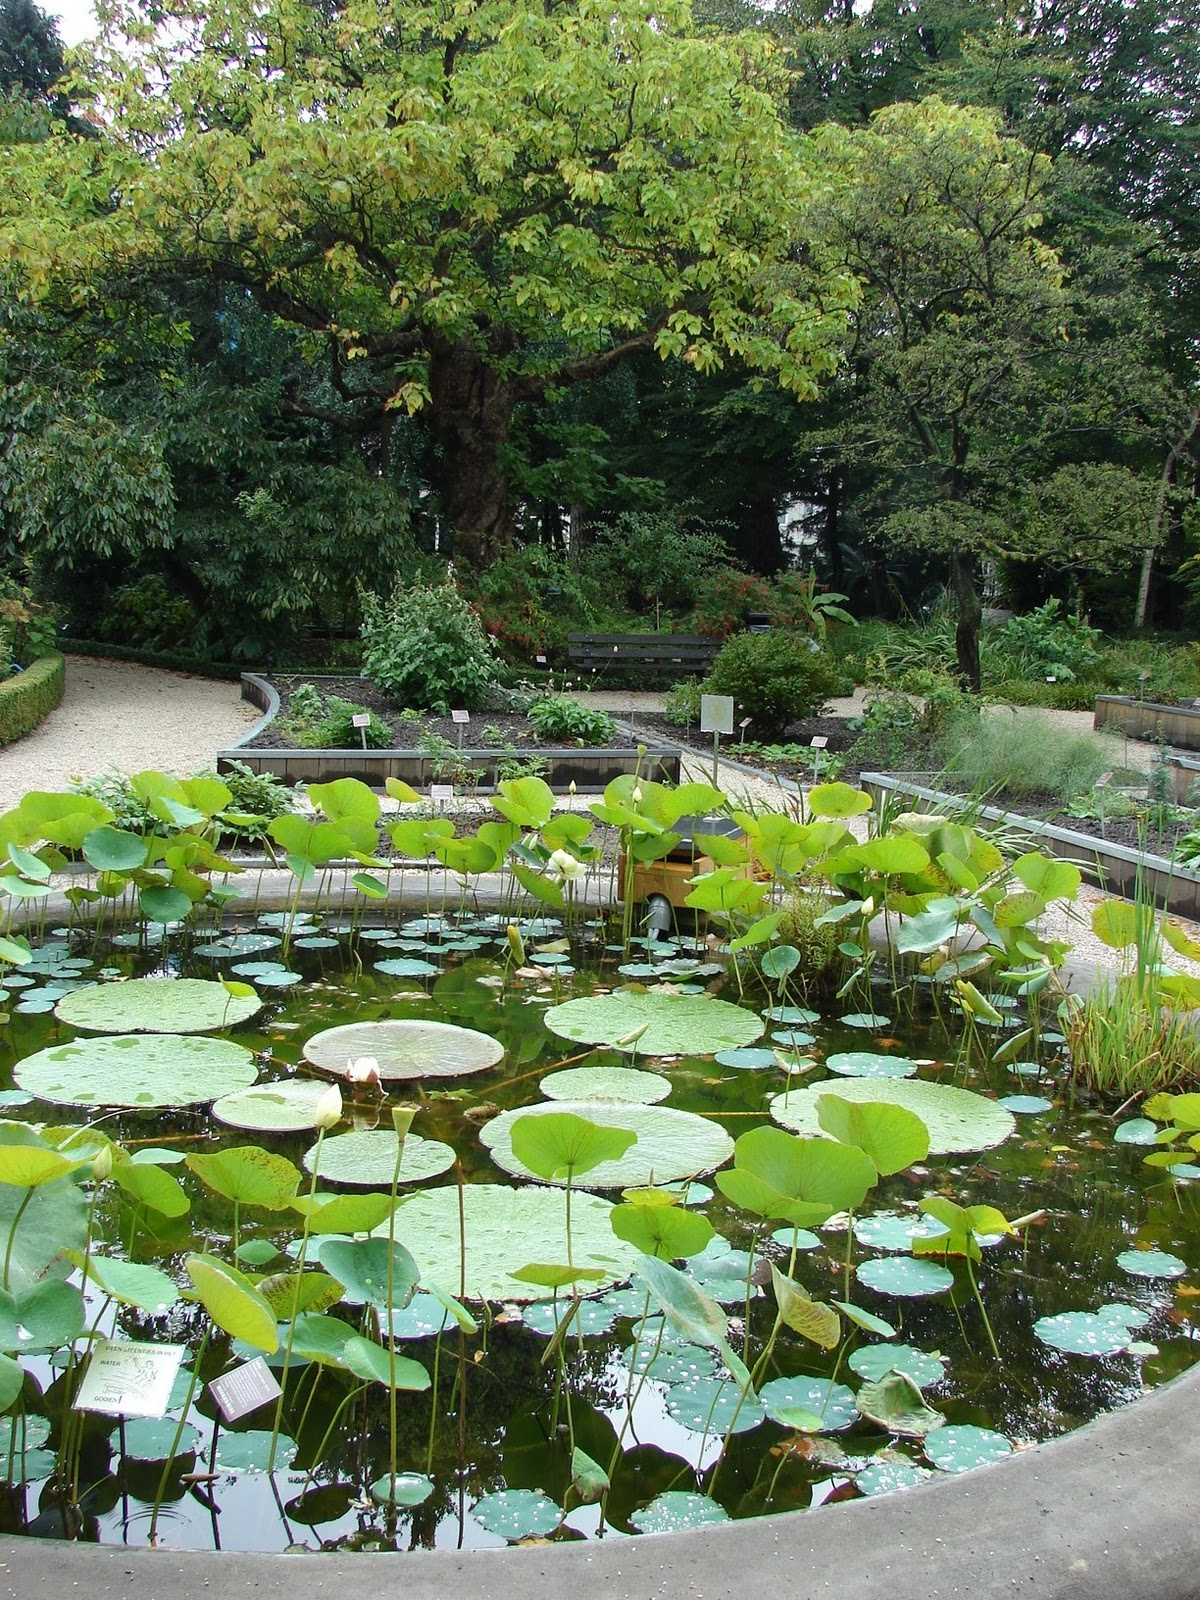 Paisajismo pueblos y jardines hortus botanicus jard n for Jardines costa rica